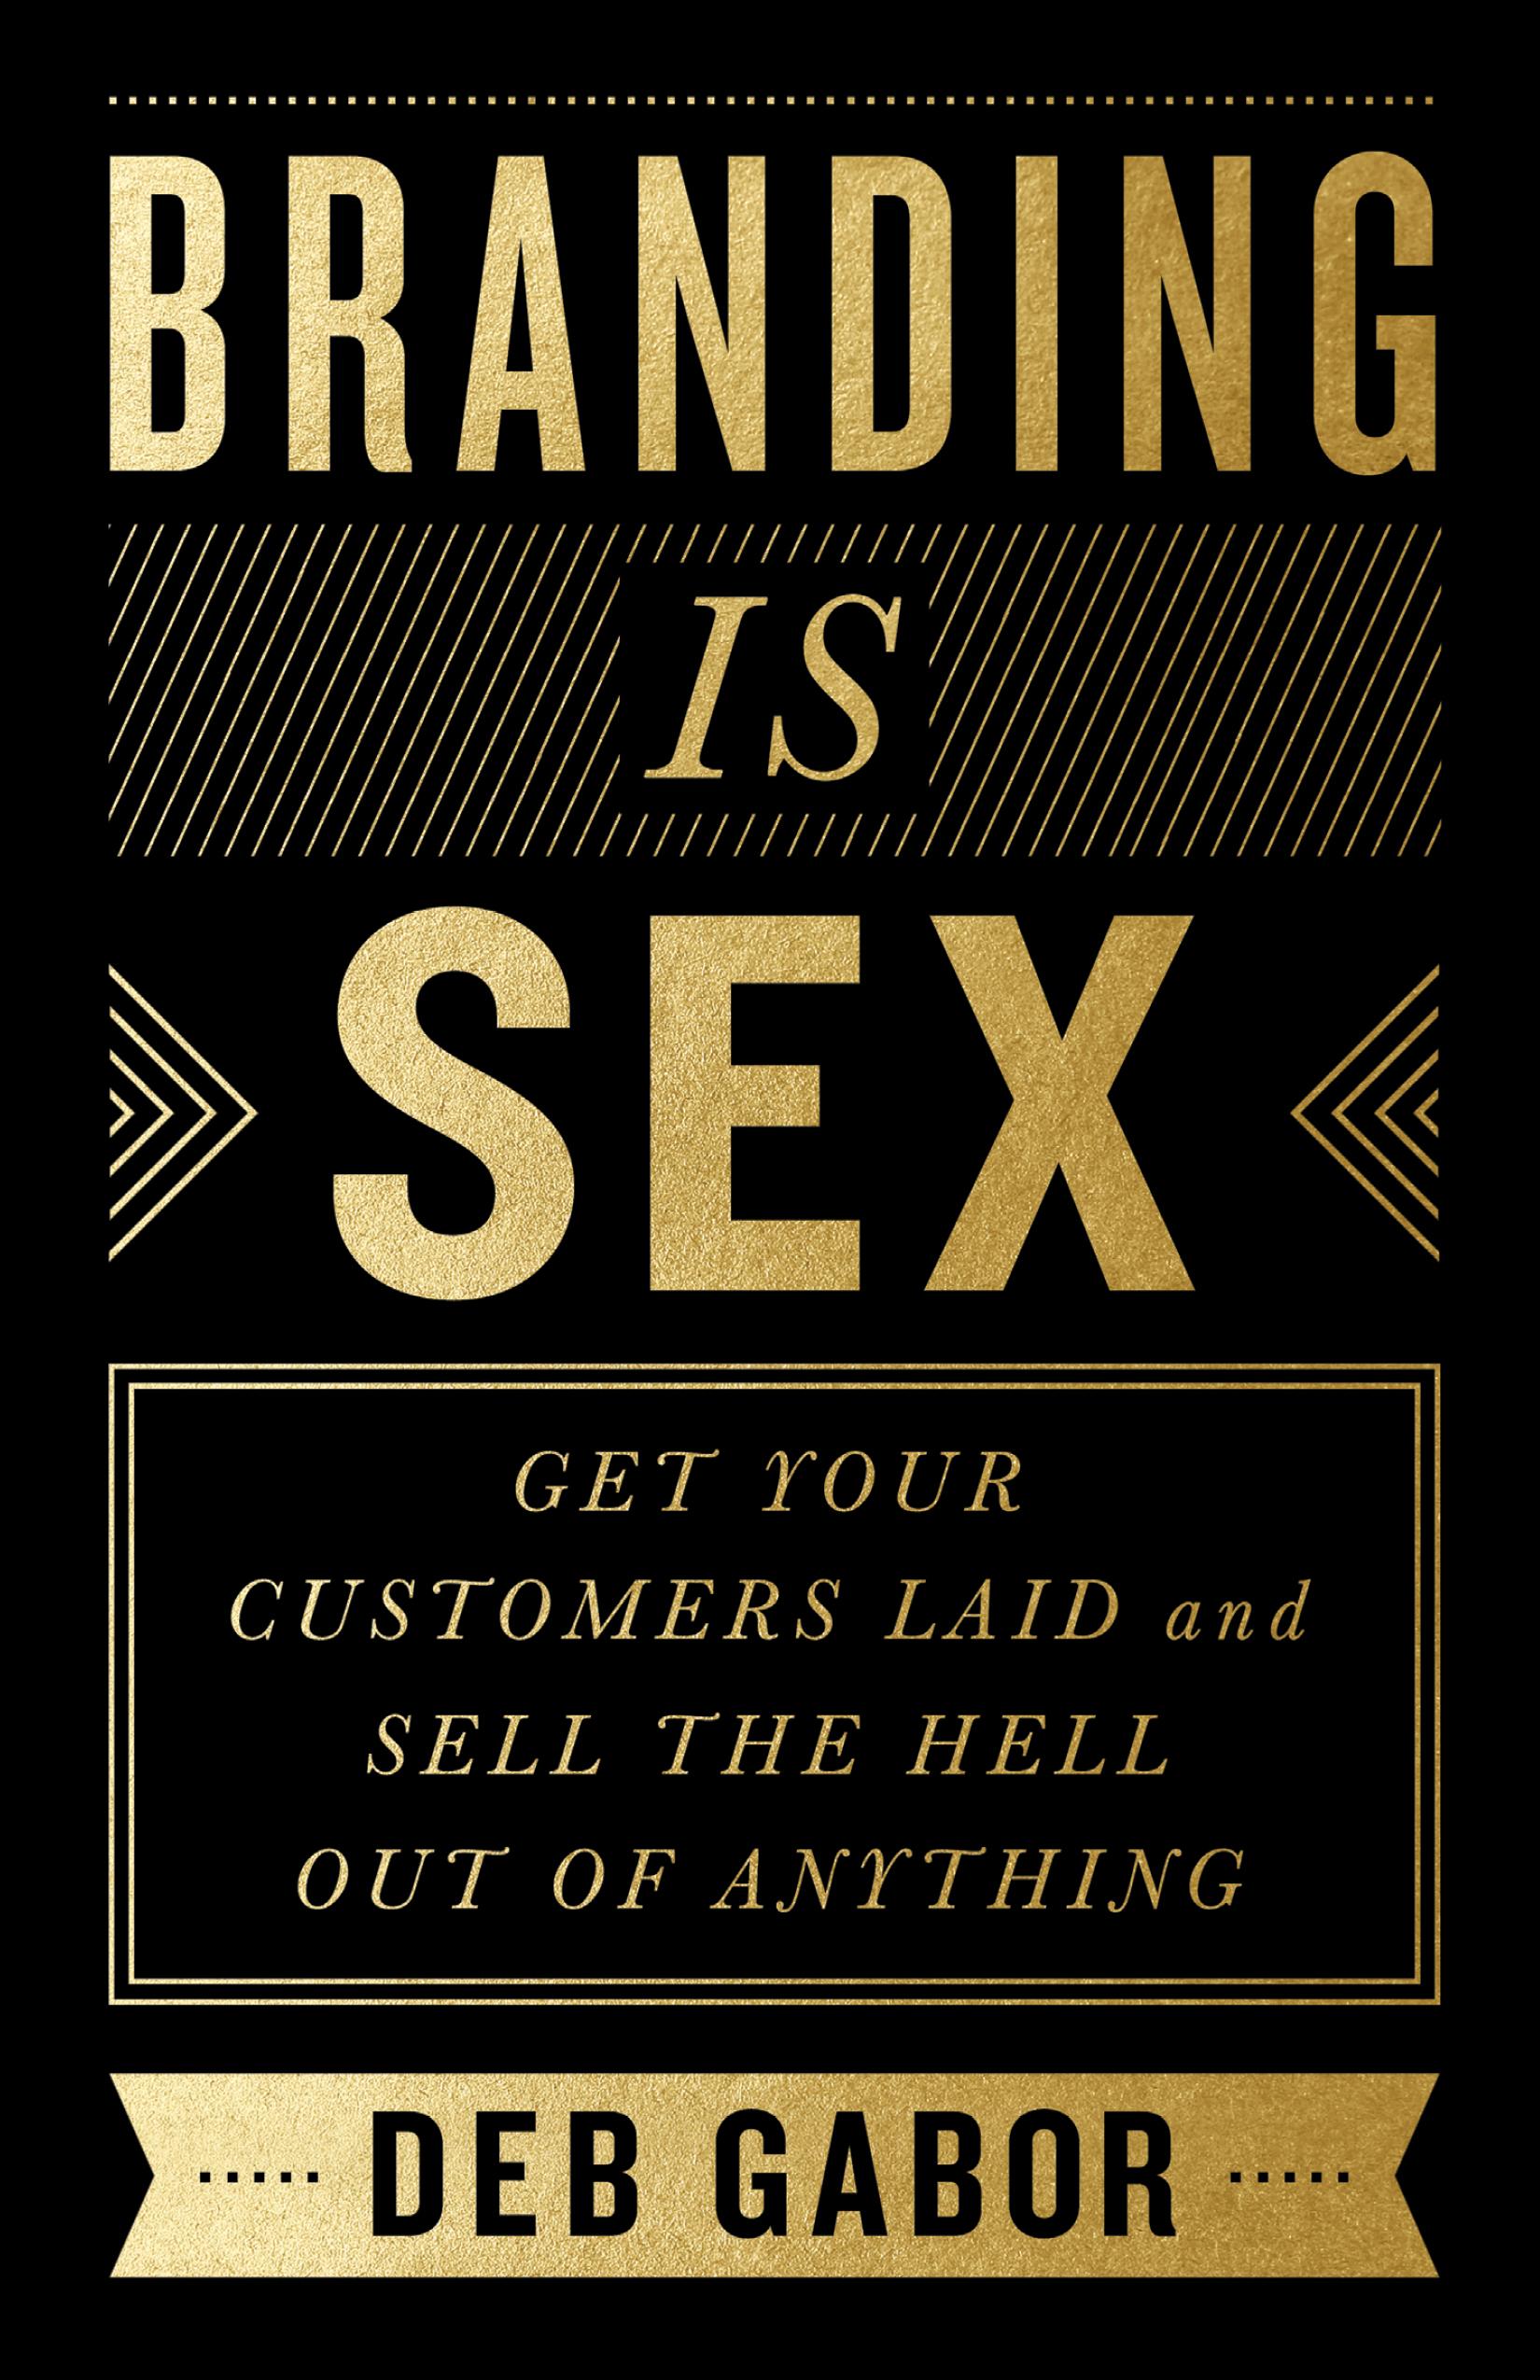 branding-is-sex-deb-gabor